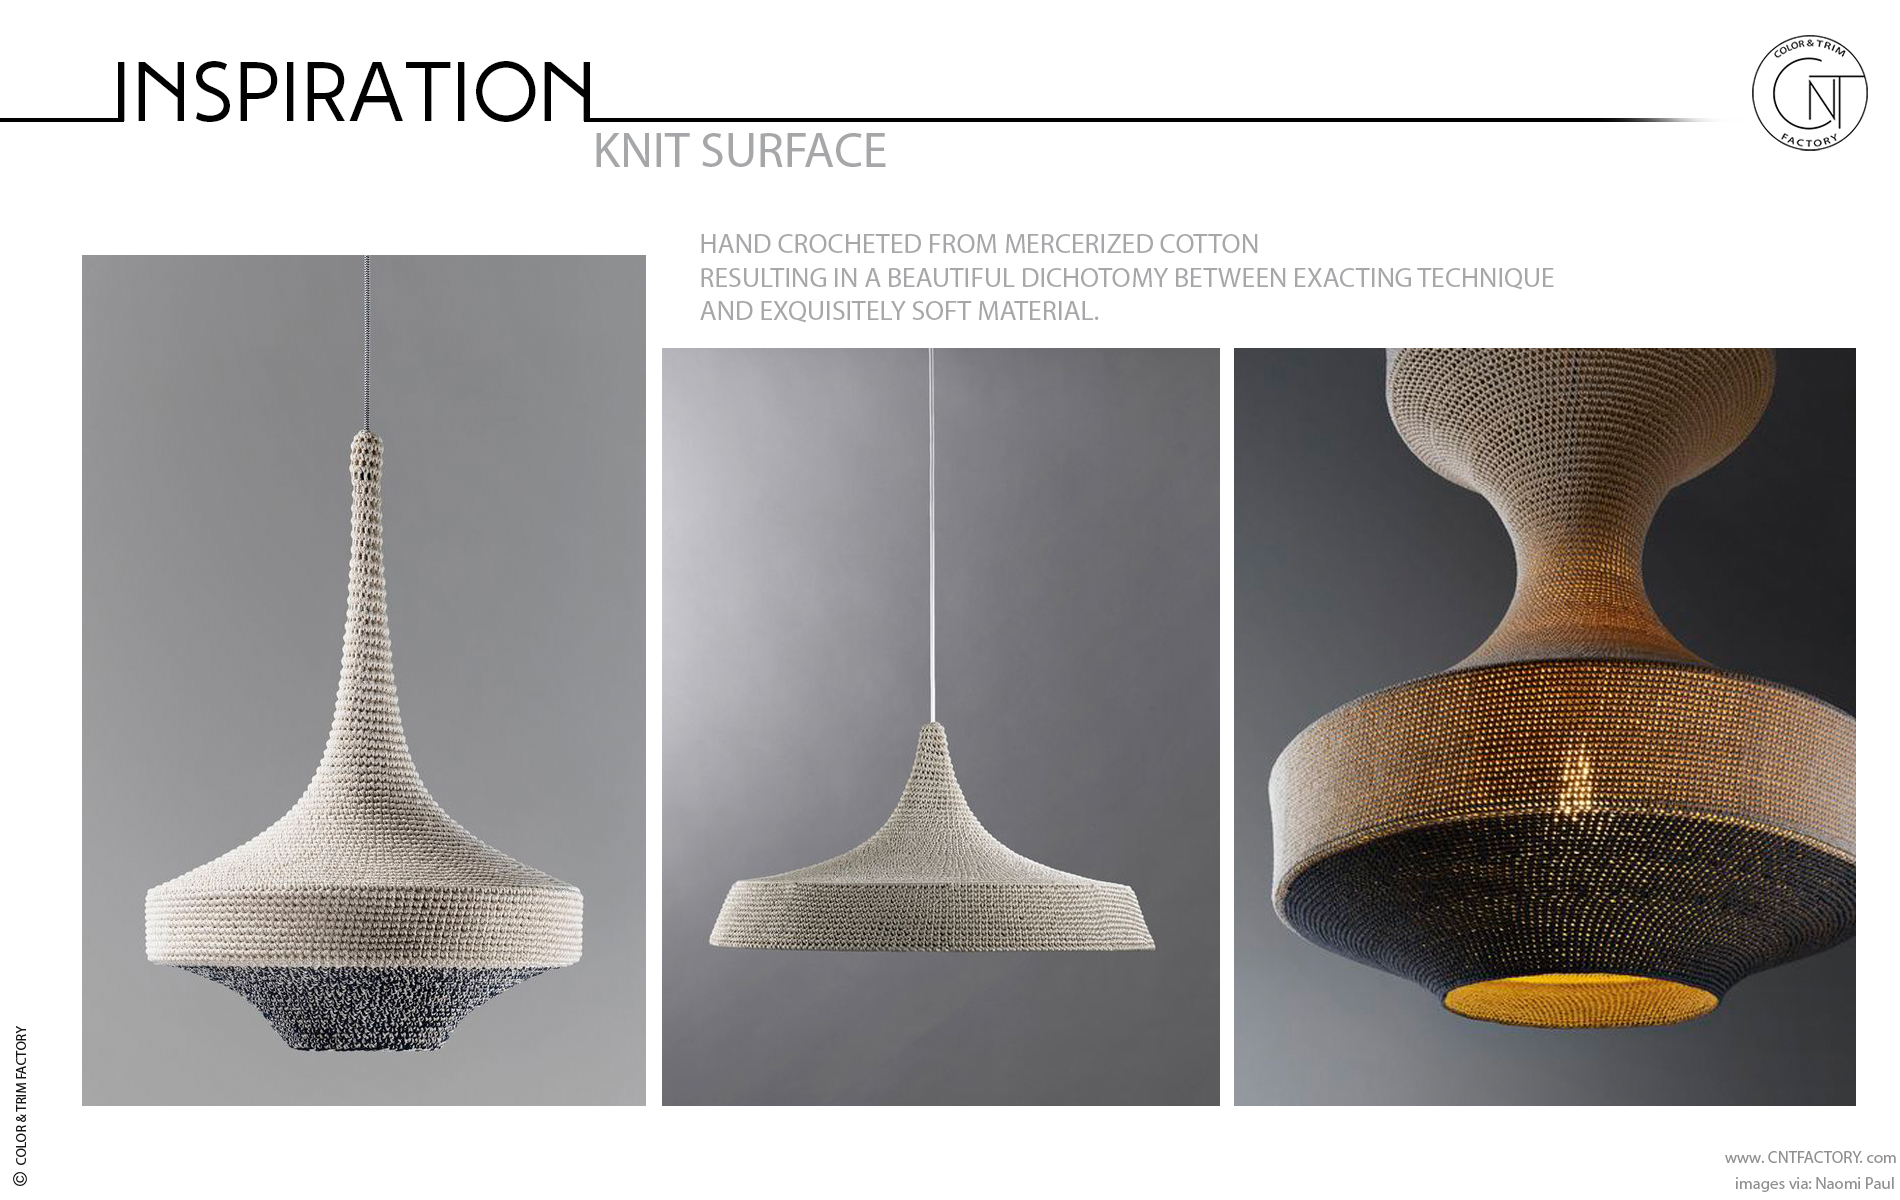 Knit surface material interior automotive color trim design